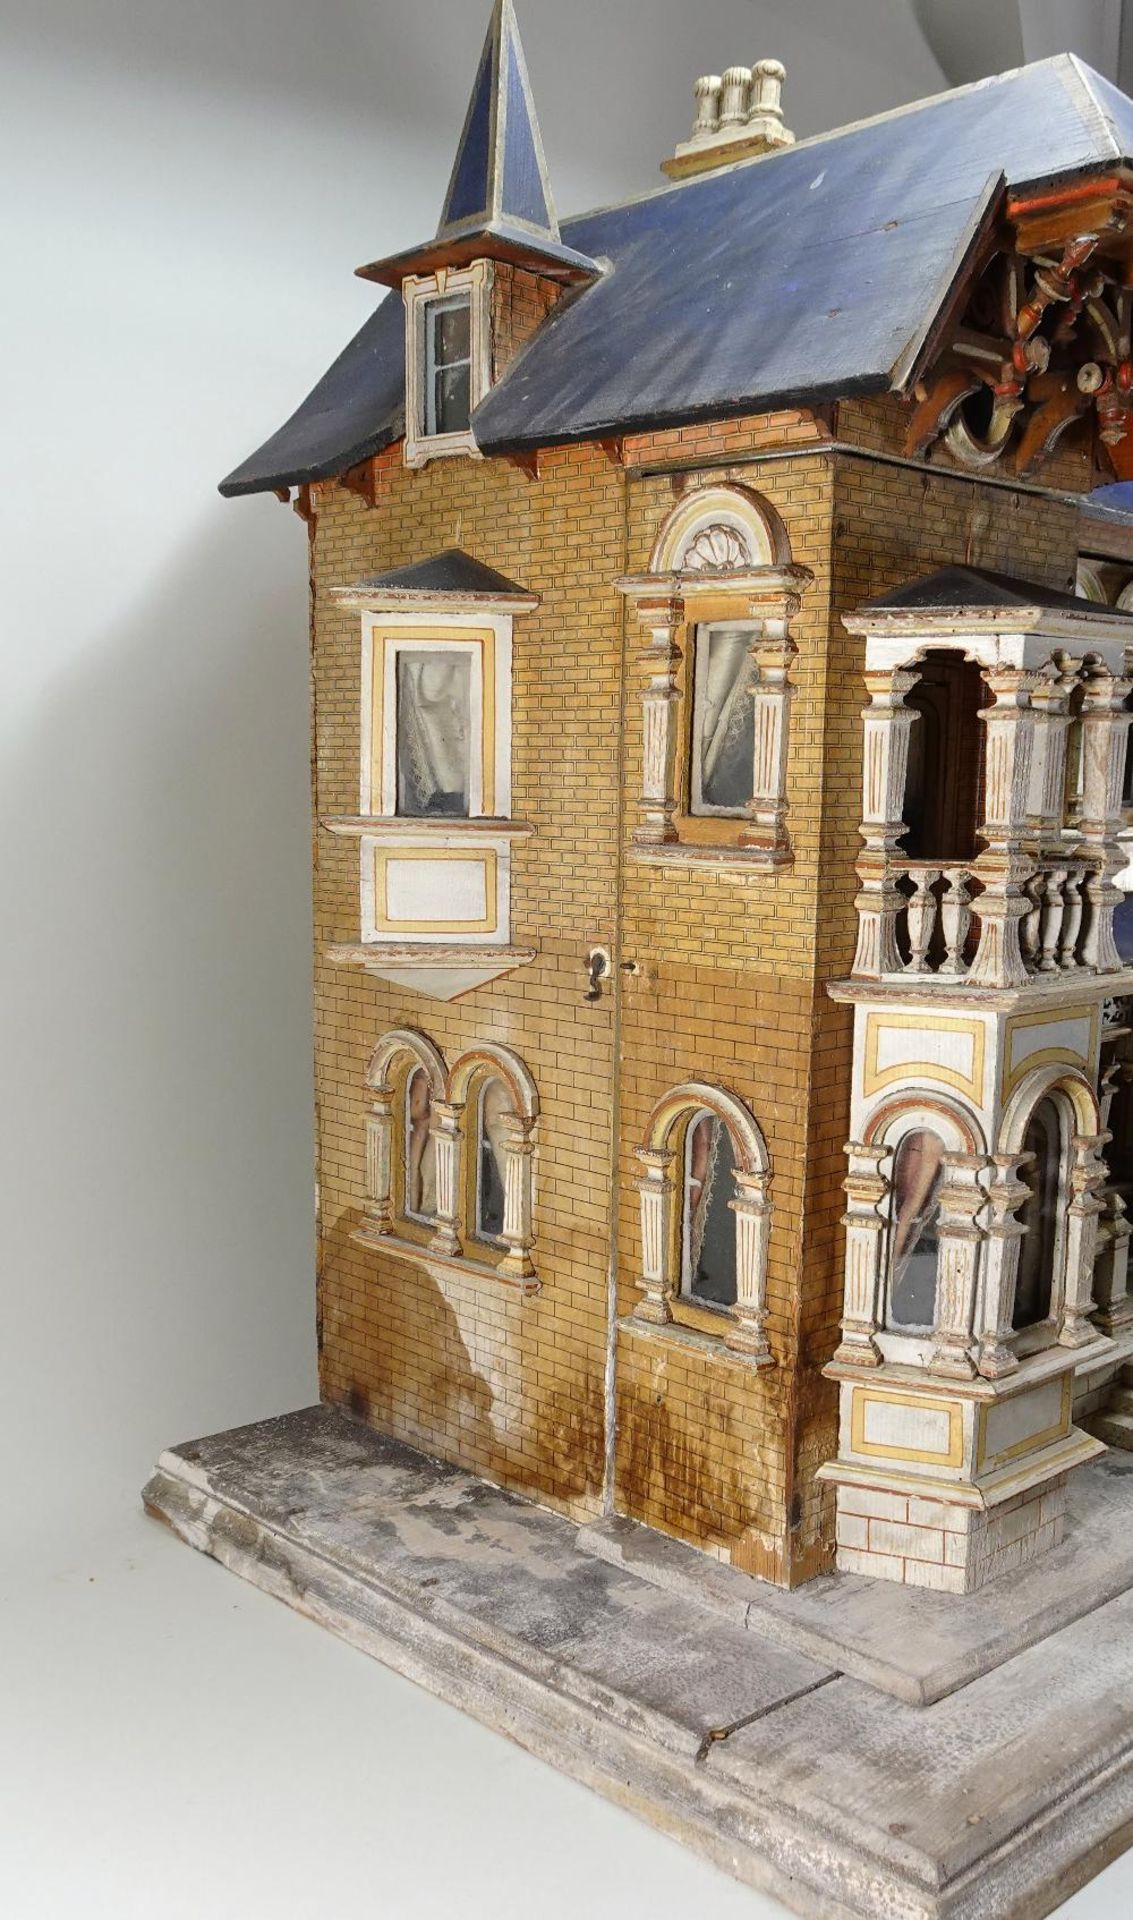 A large and impressive Moritz Gottschalk blue roof dolls house model: 2556/2 in original condition, - Image 5 of 13